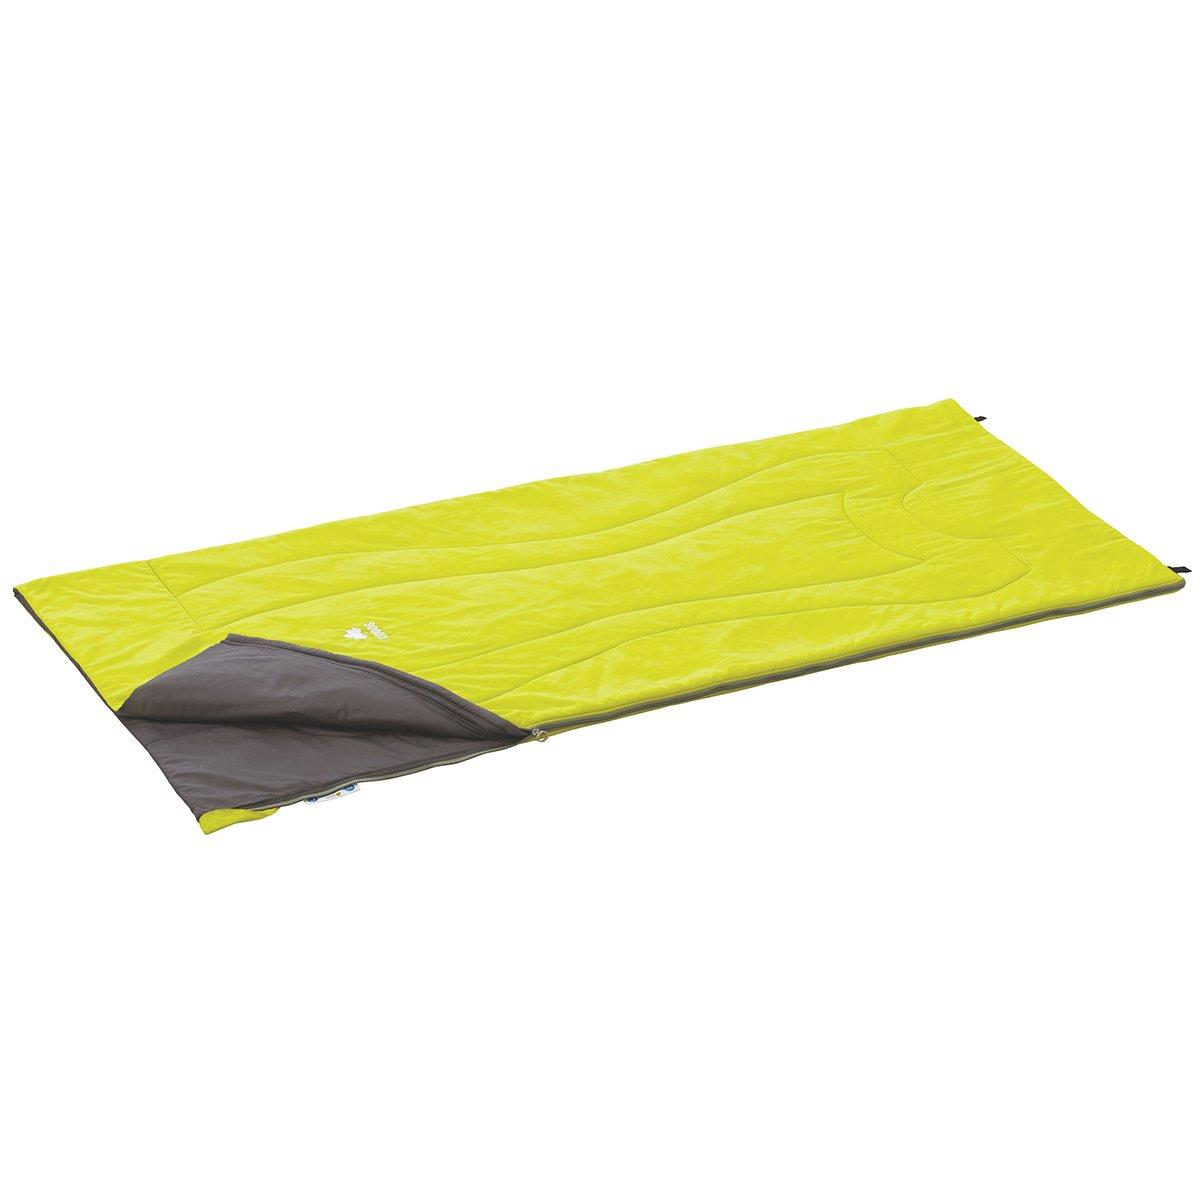 Logos sleeping  bag ultra compact sleeping bag, 2  supply quality product